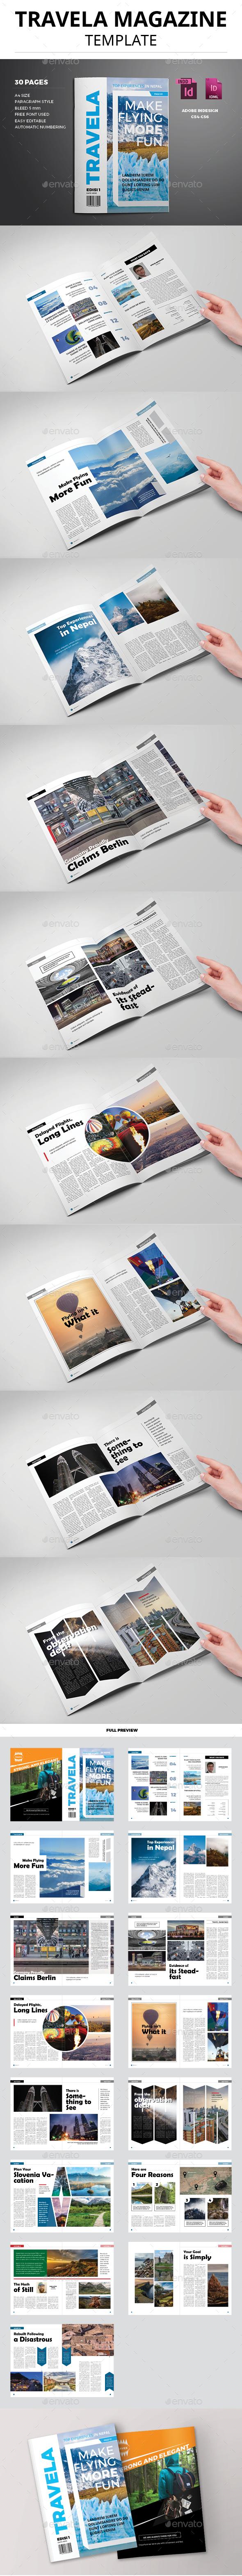 Travela Magazine Template - Magazines Print Templates